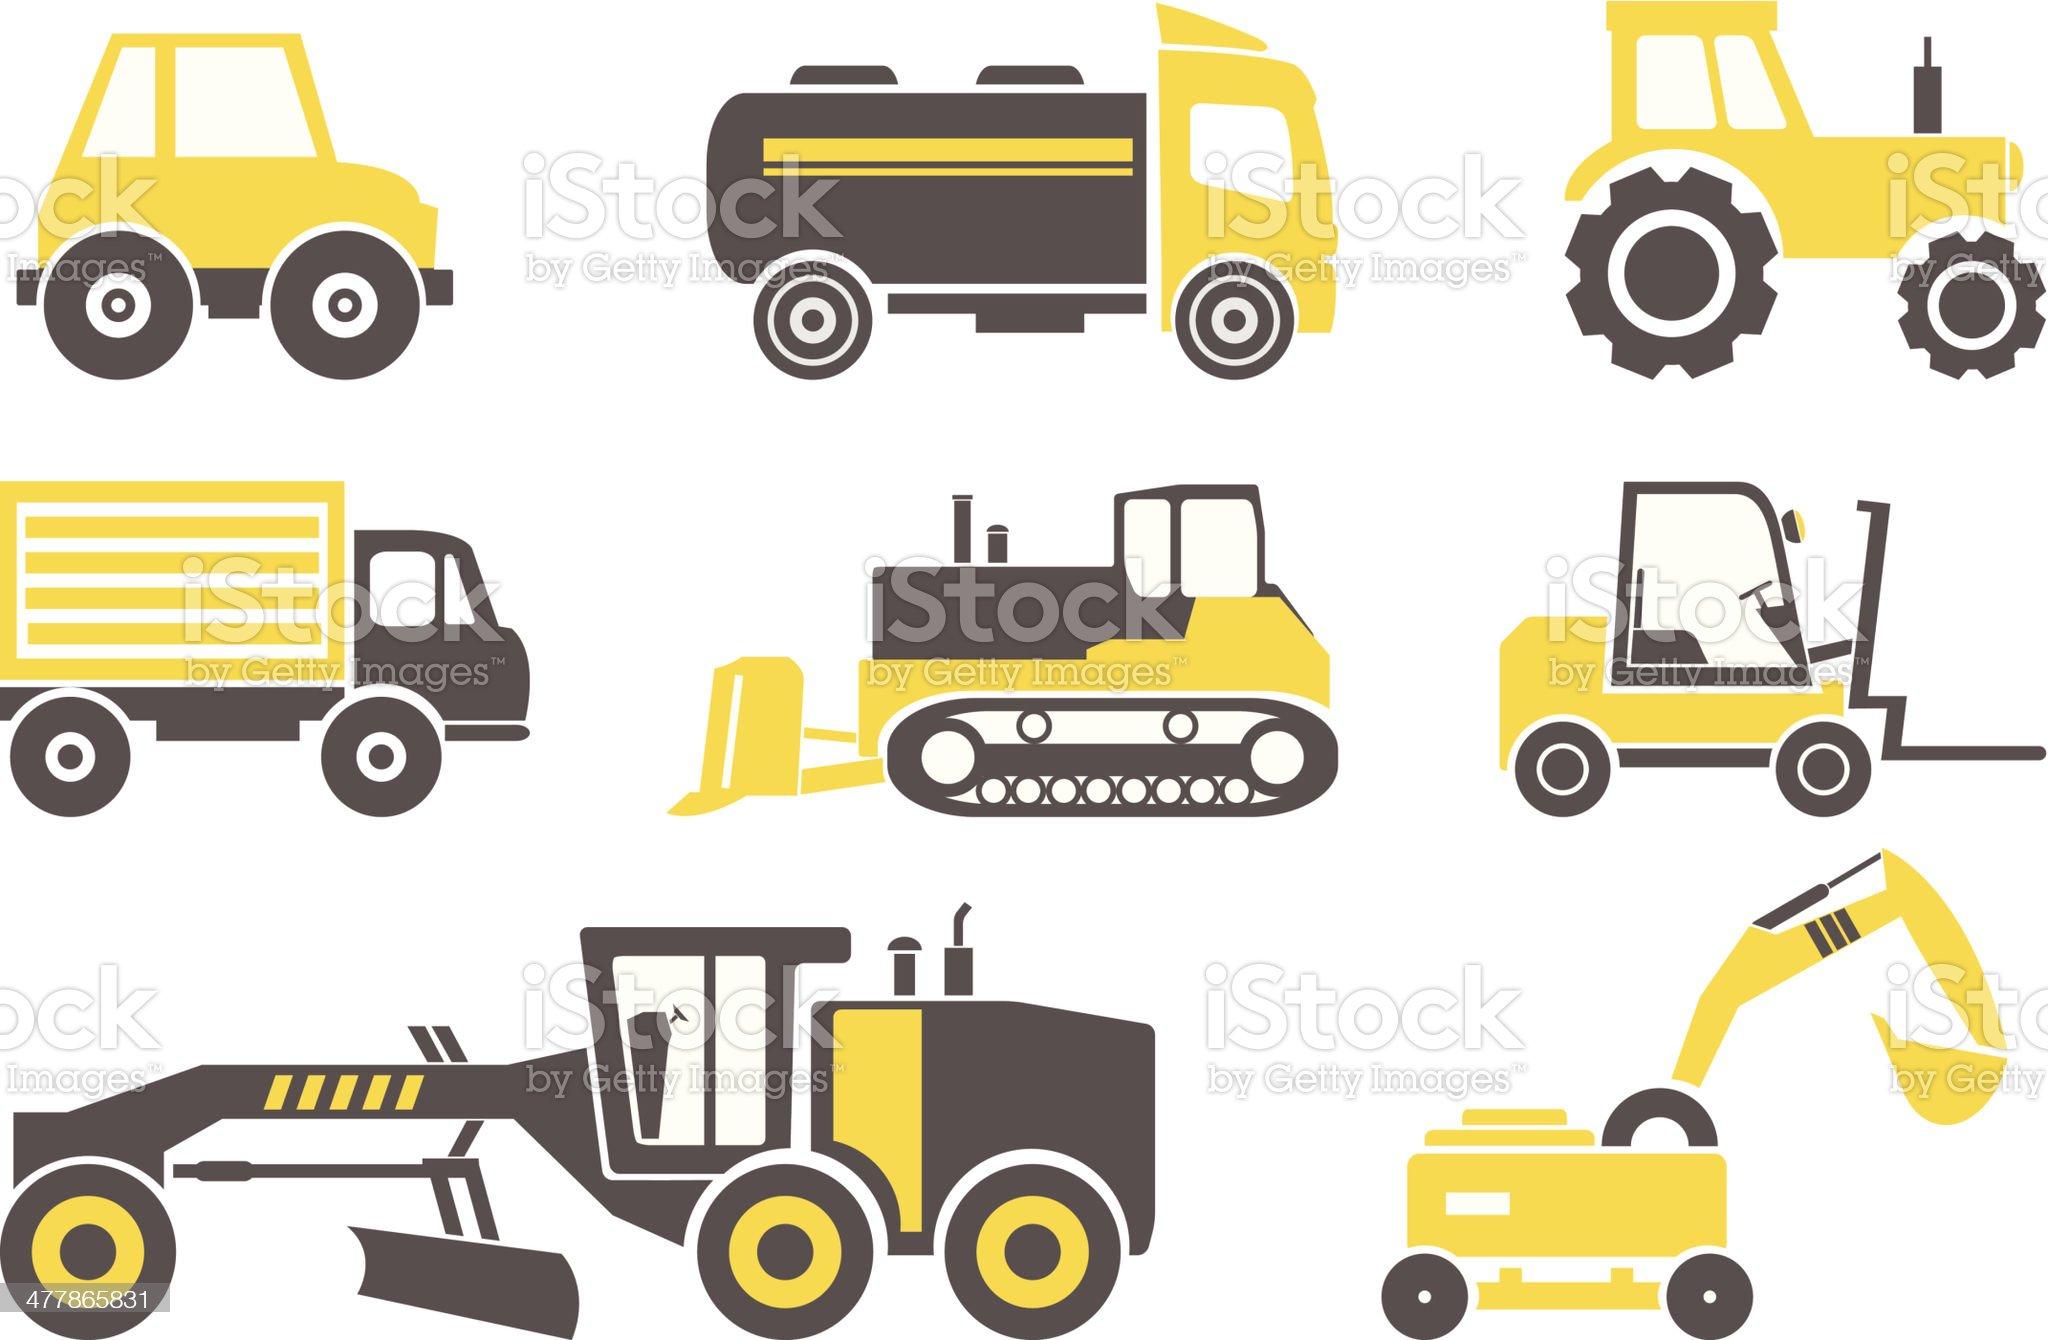 Construction machines royalty-free stock vector art